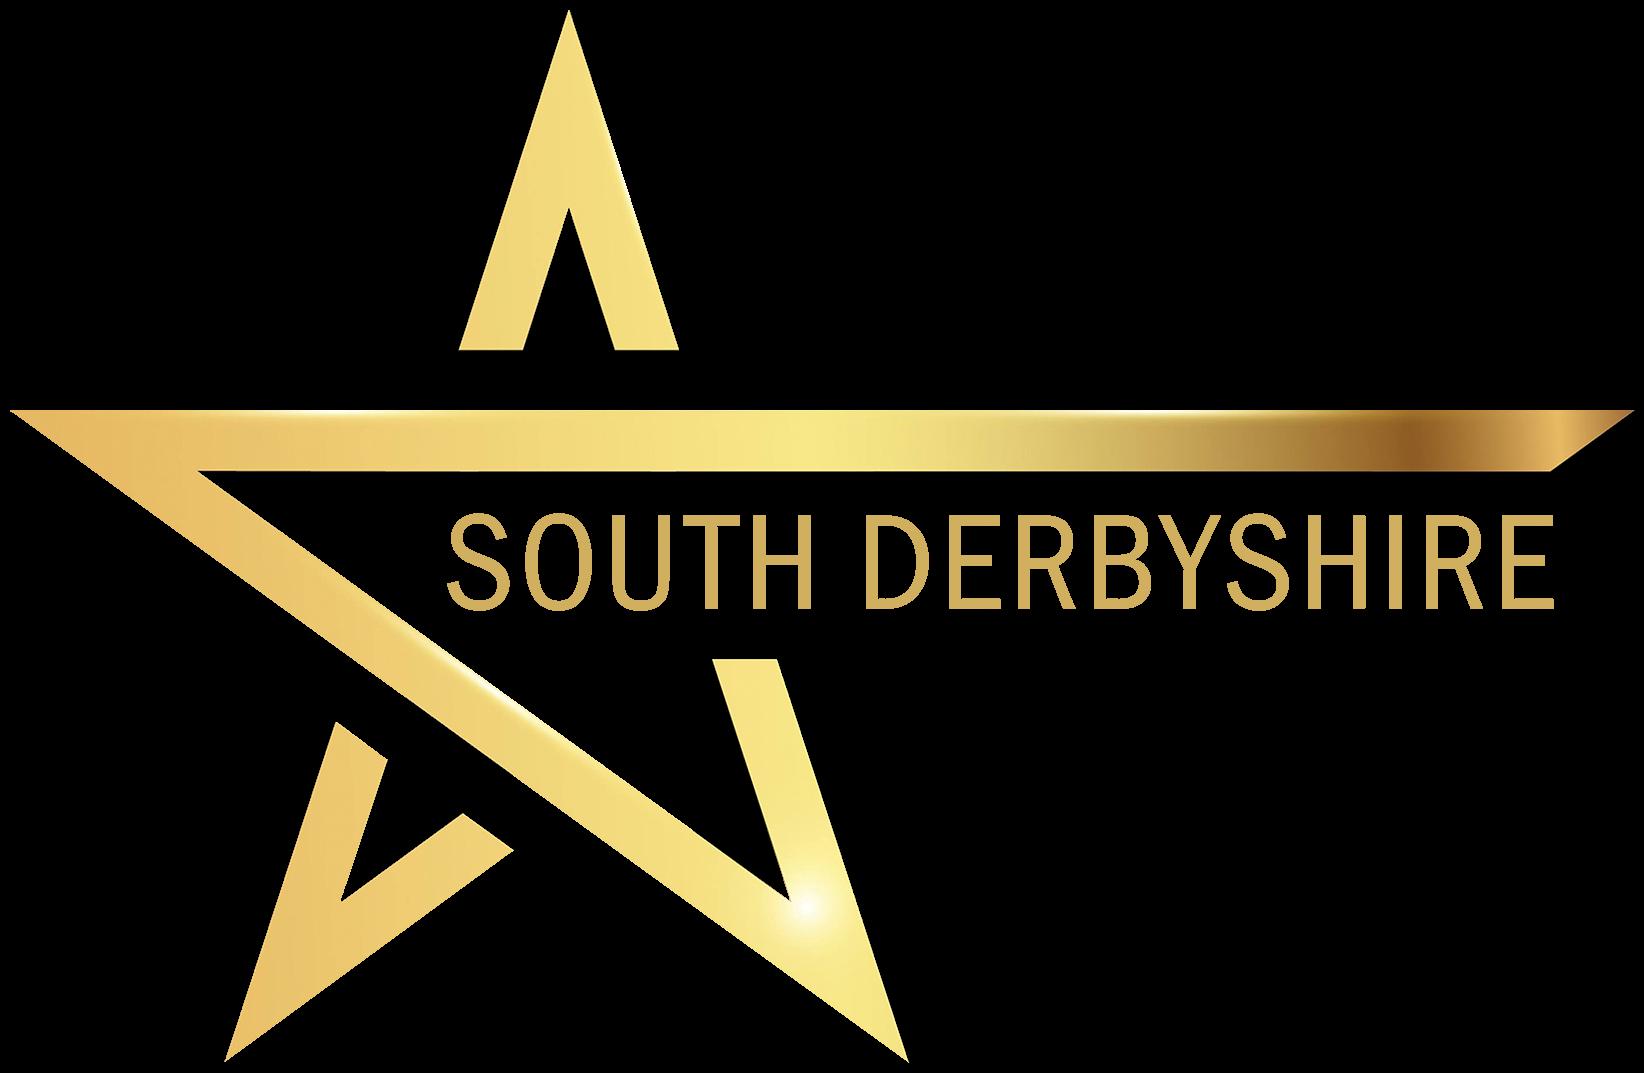 South Derbyshire Awards